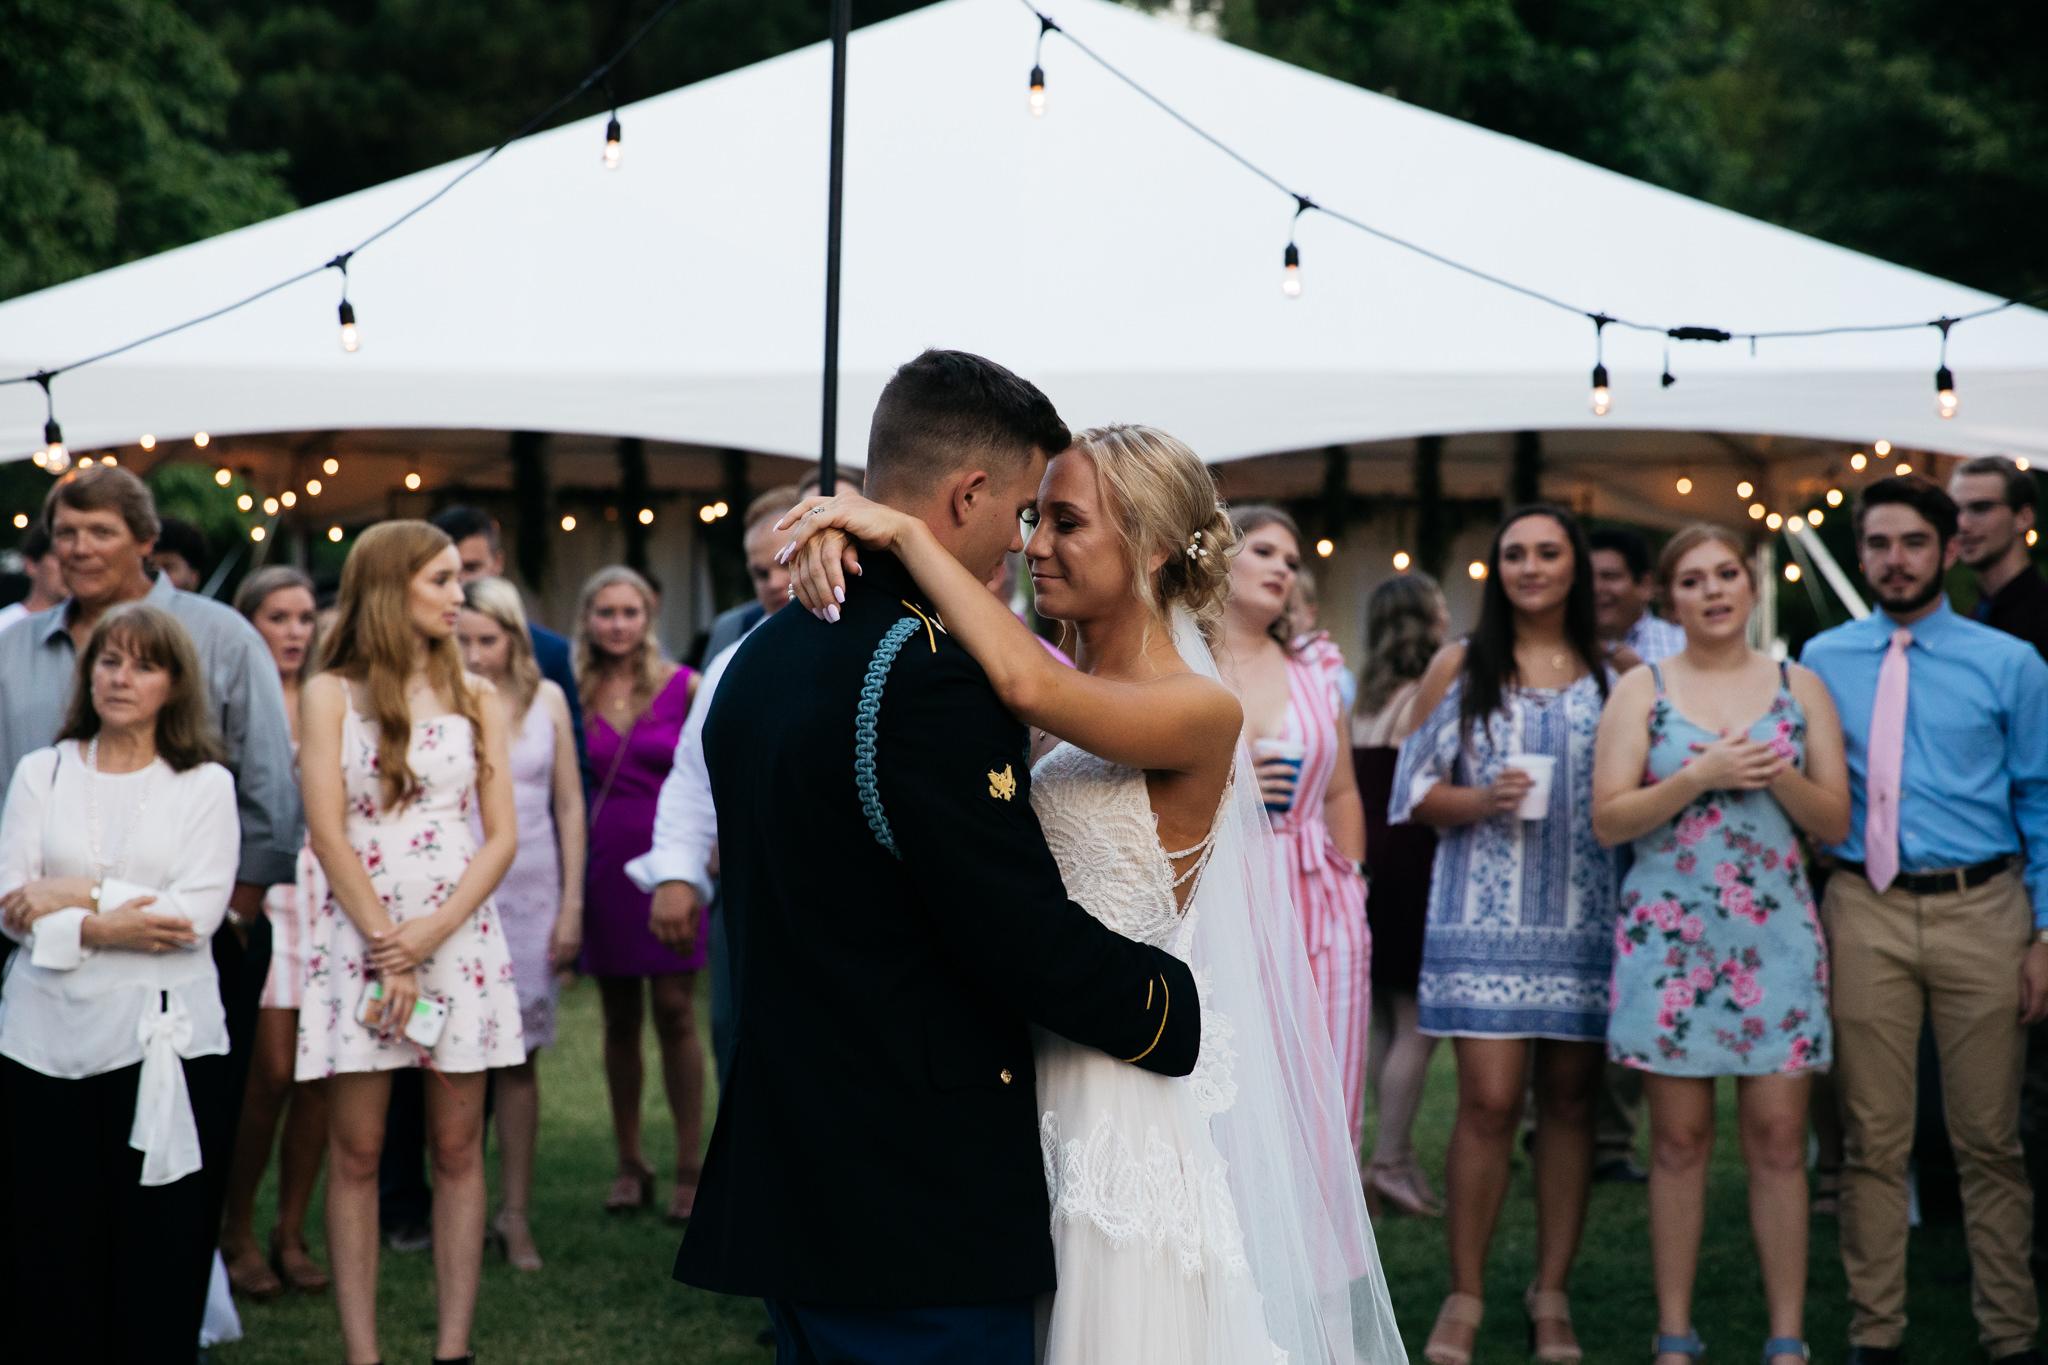 backyard-wedding-thewarmtharoundyou-lexy-branson-20.jpg